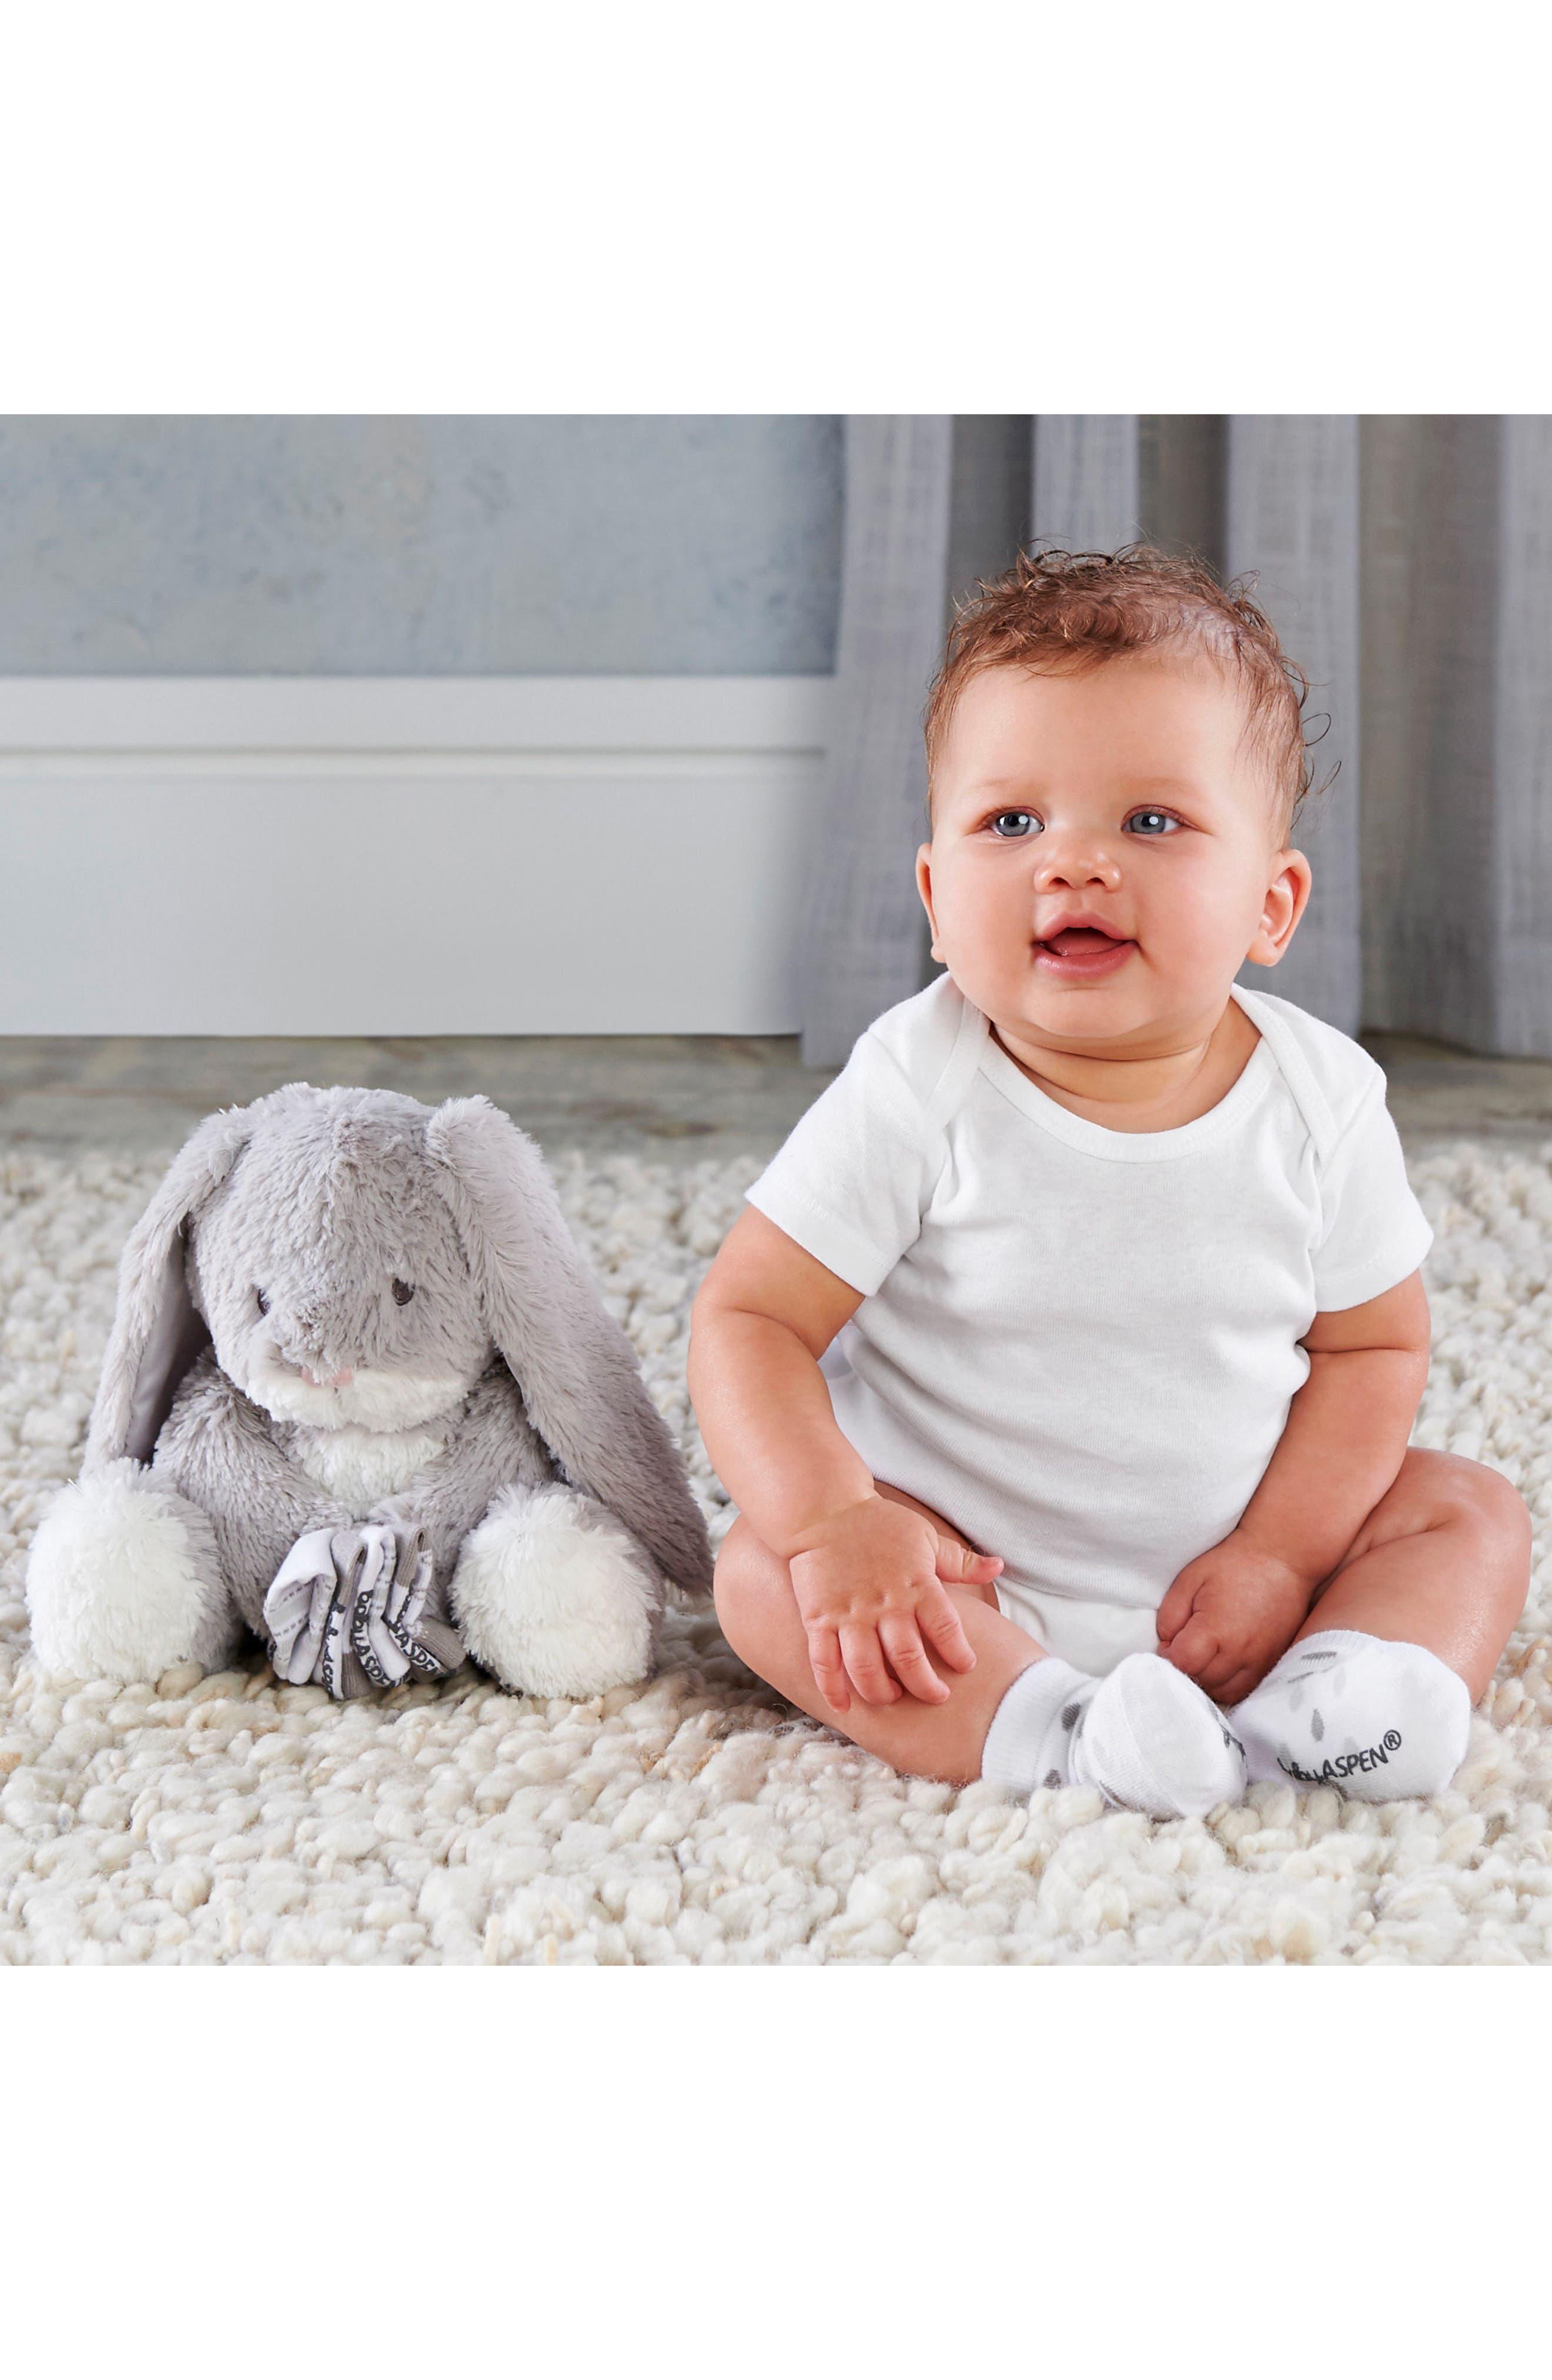 Alternate Image 3  - Baby Aspen Bunnie Hooded Robe & Stuffed Animal